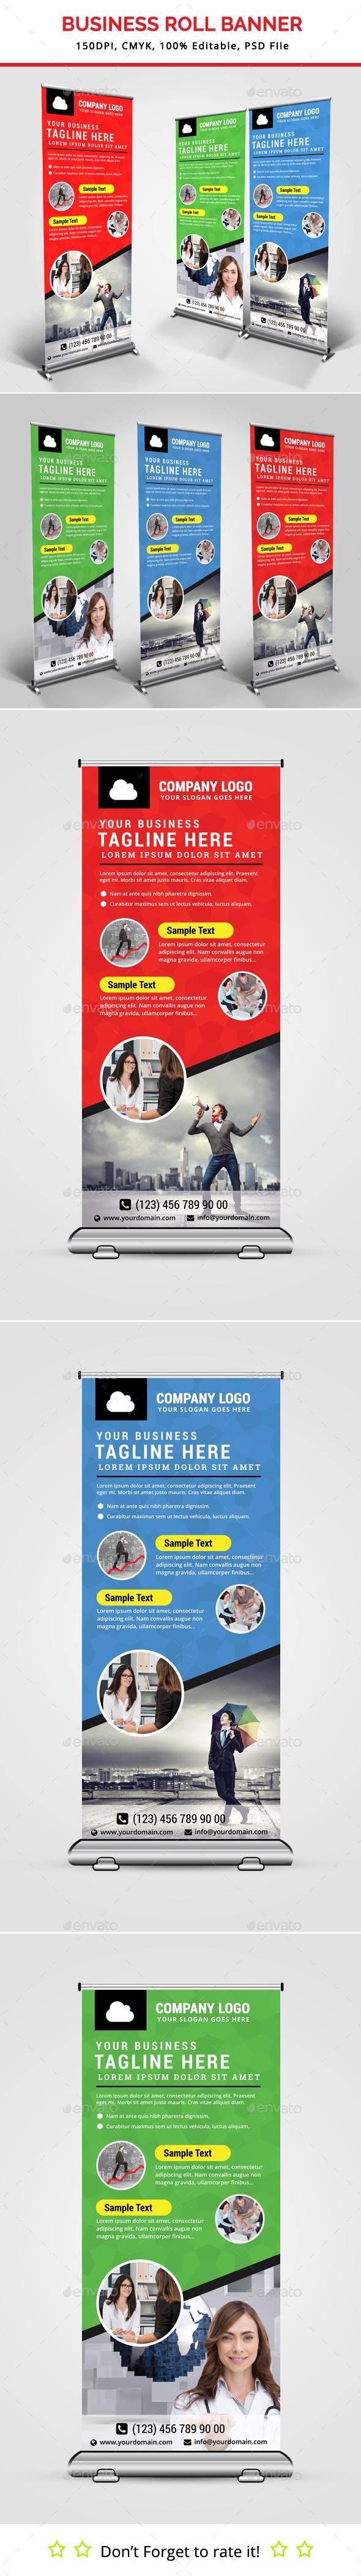 Business Roll Up Banner V21 - Signage Print Templates